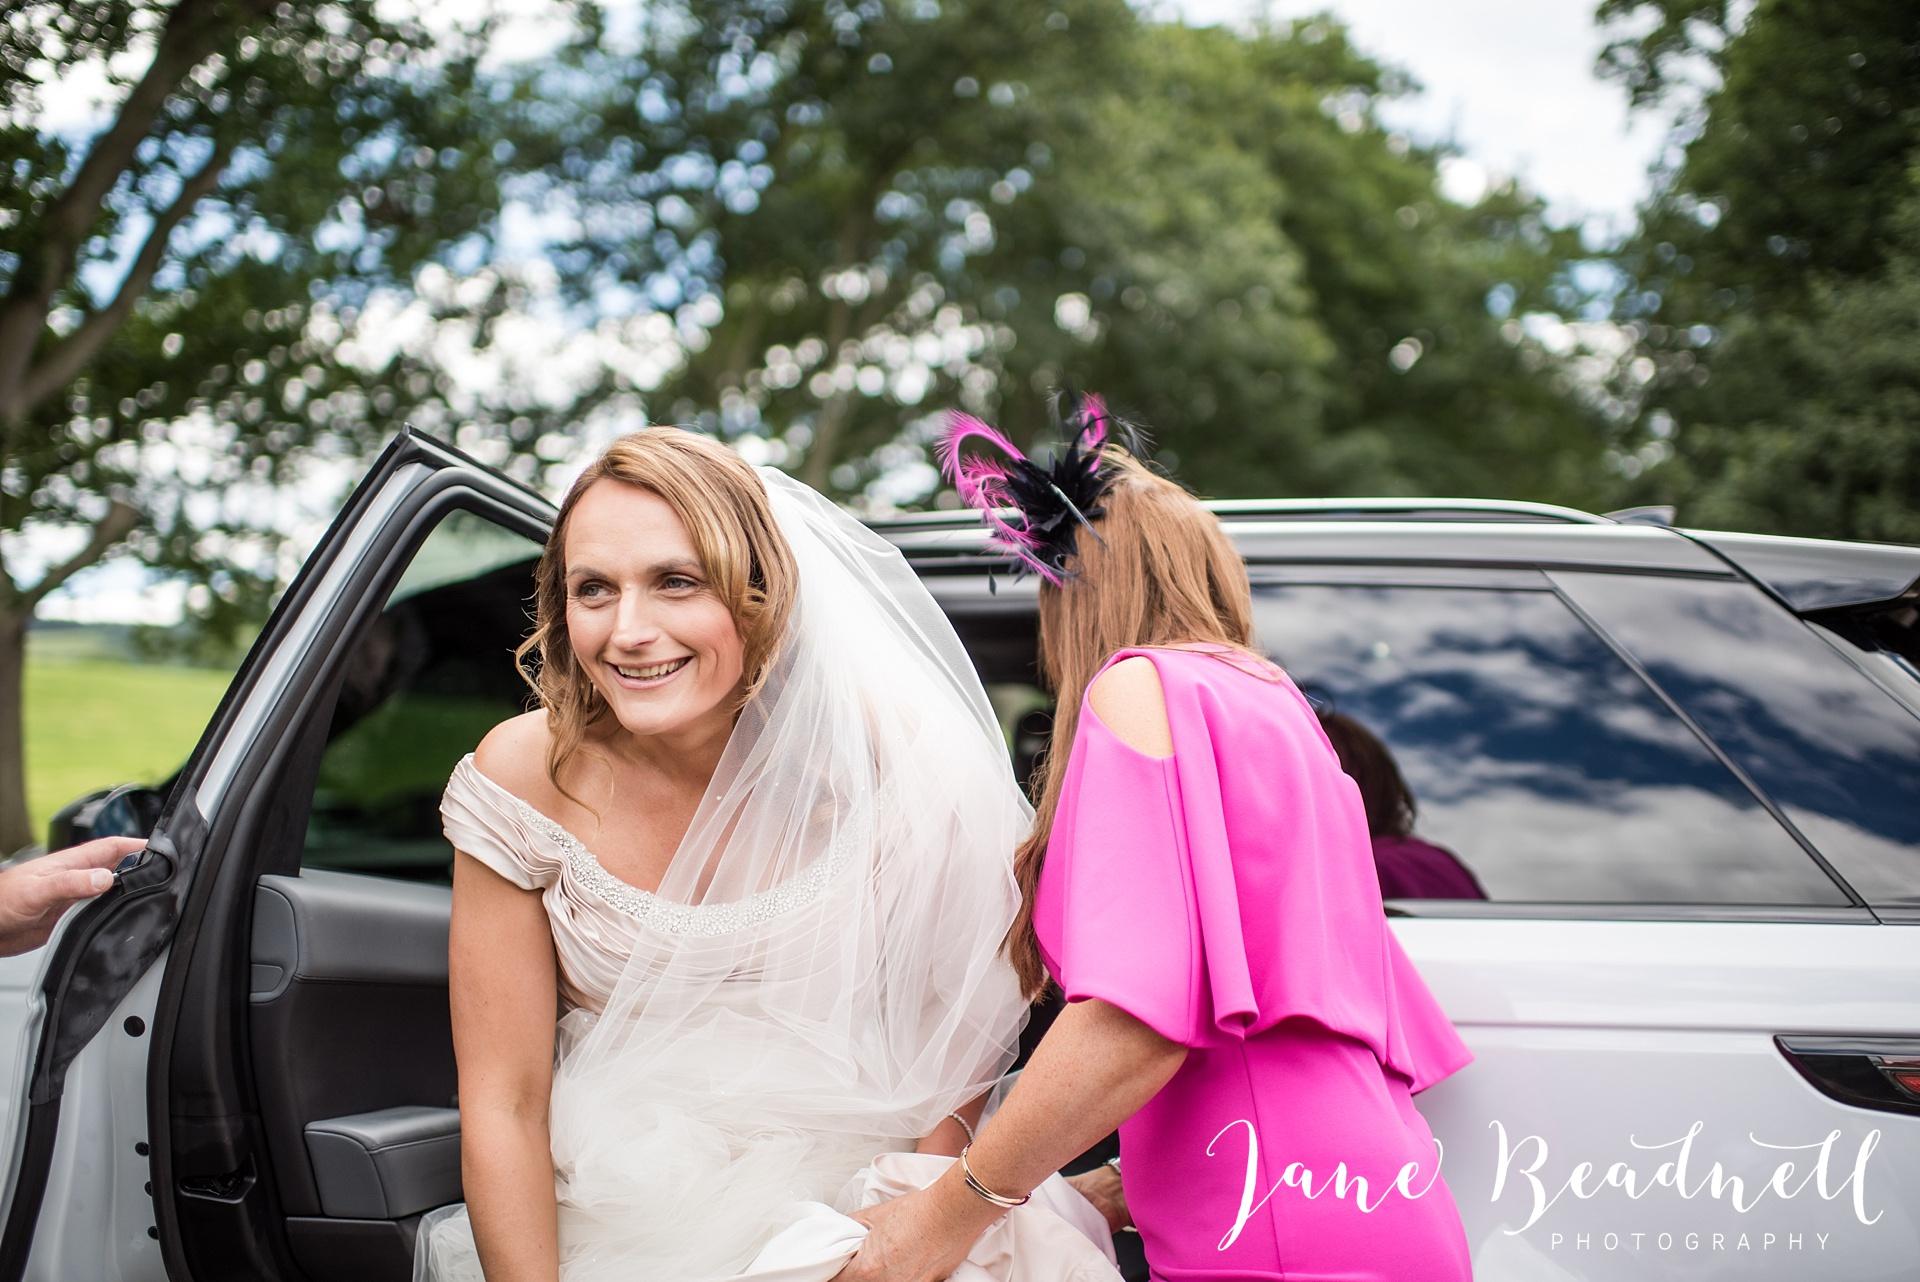 Jervaulx Abbey outdoor wedding Ripon, Yorkshire wedding photographer Jane  Beadnell_0045